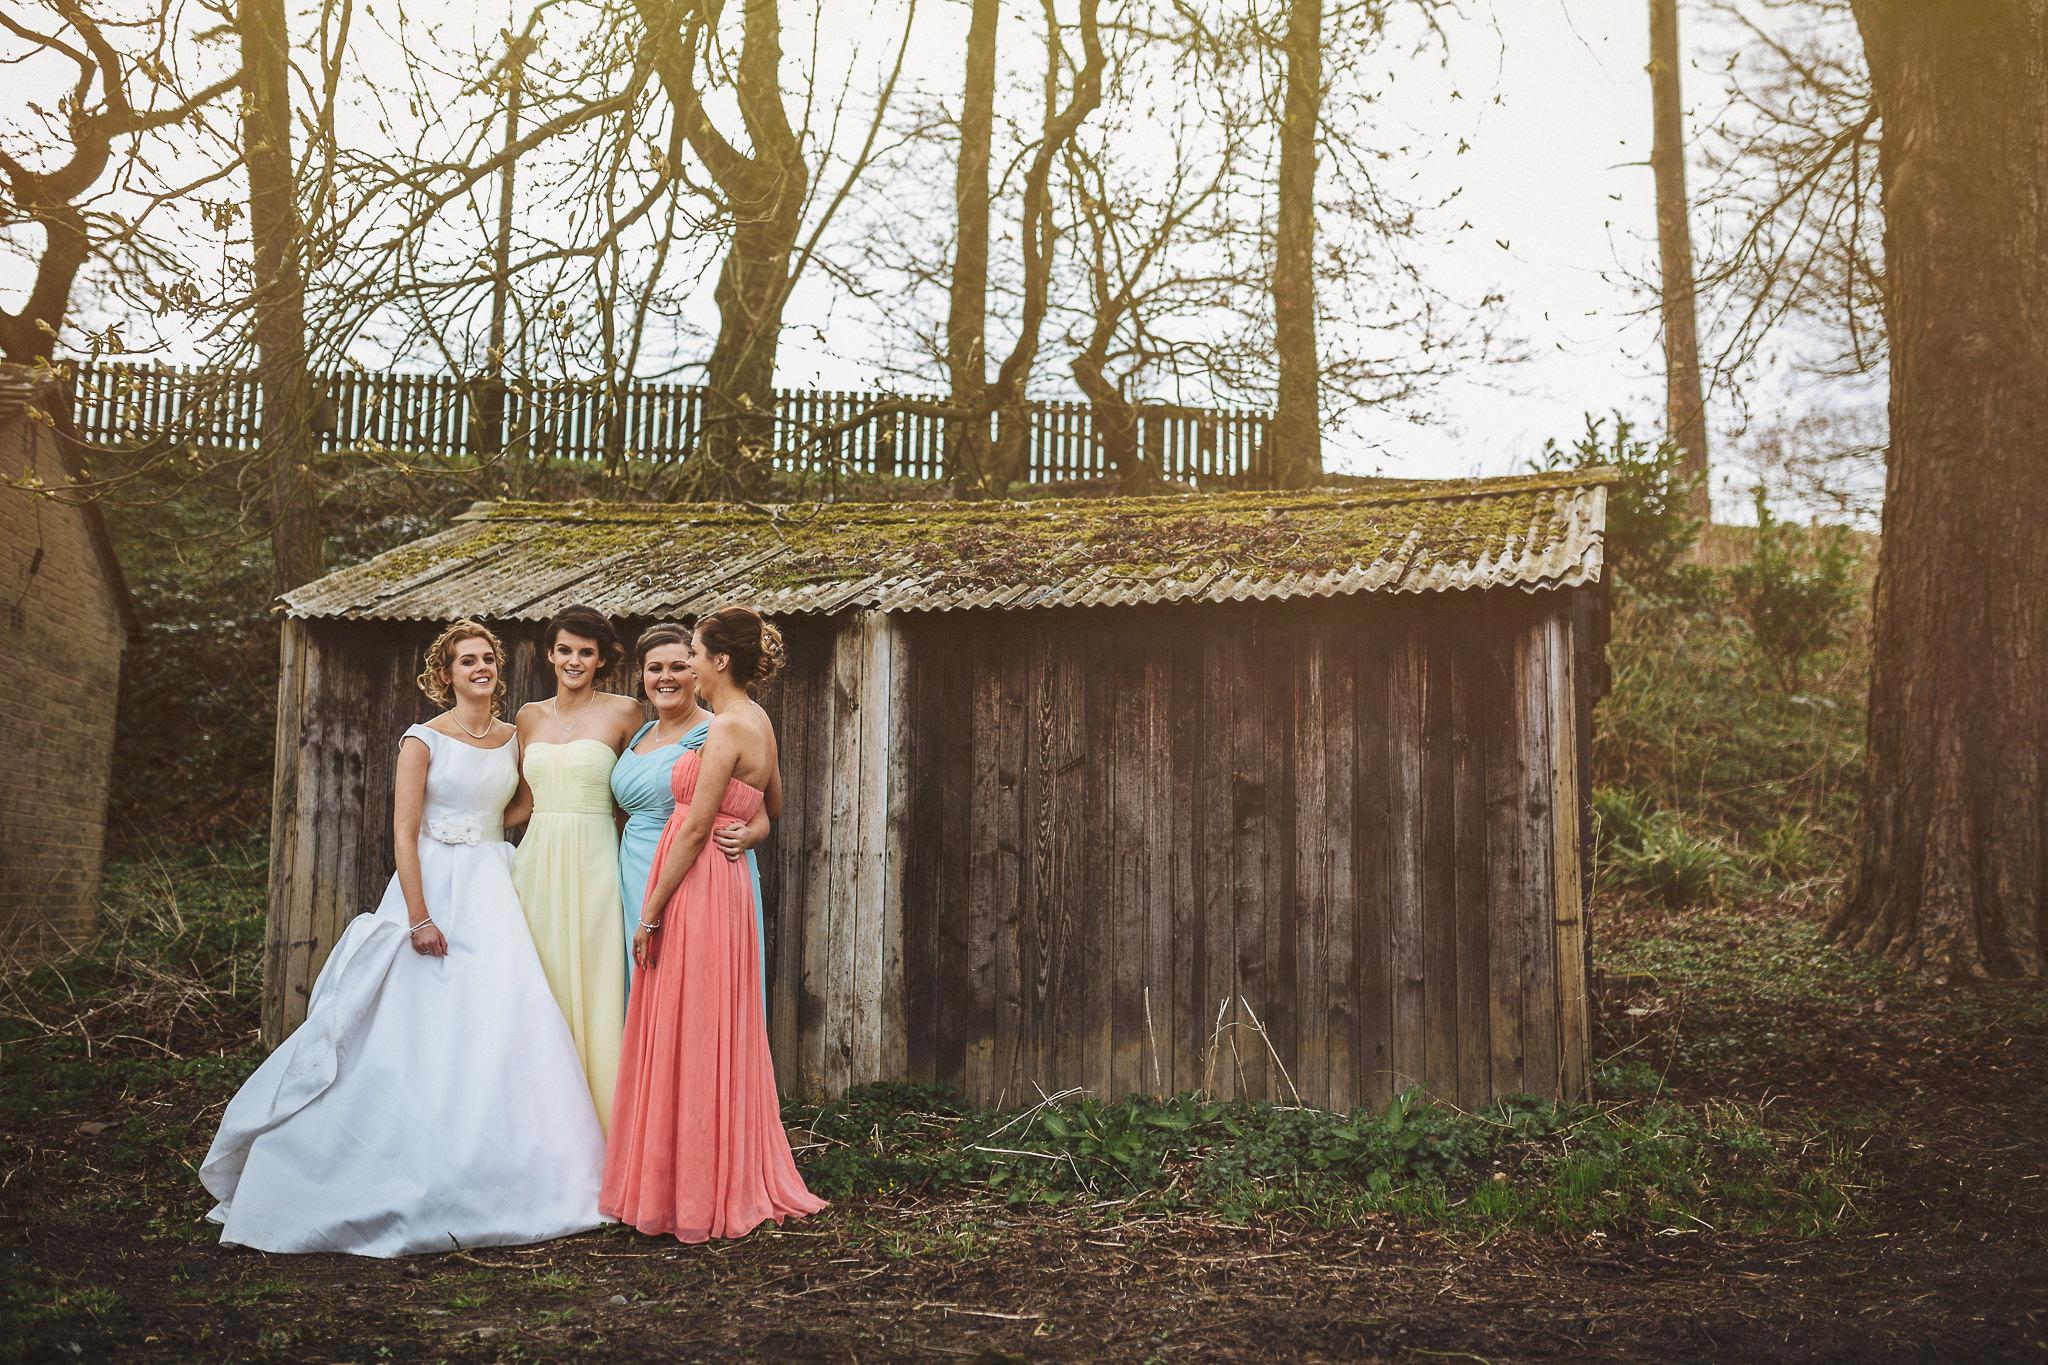 Lancashire-Creative-natural-documentary-wedding-photography-90078